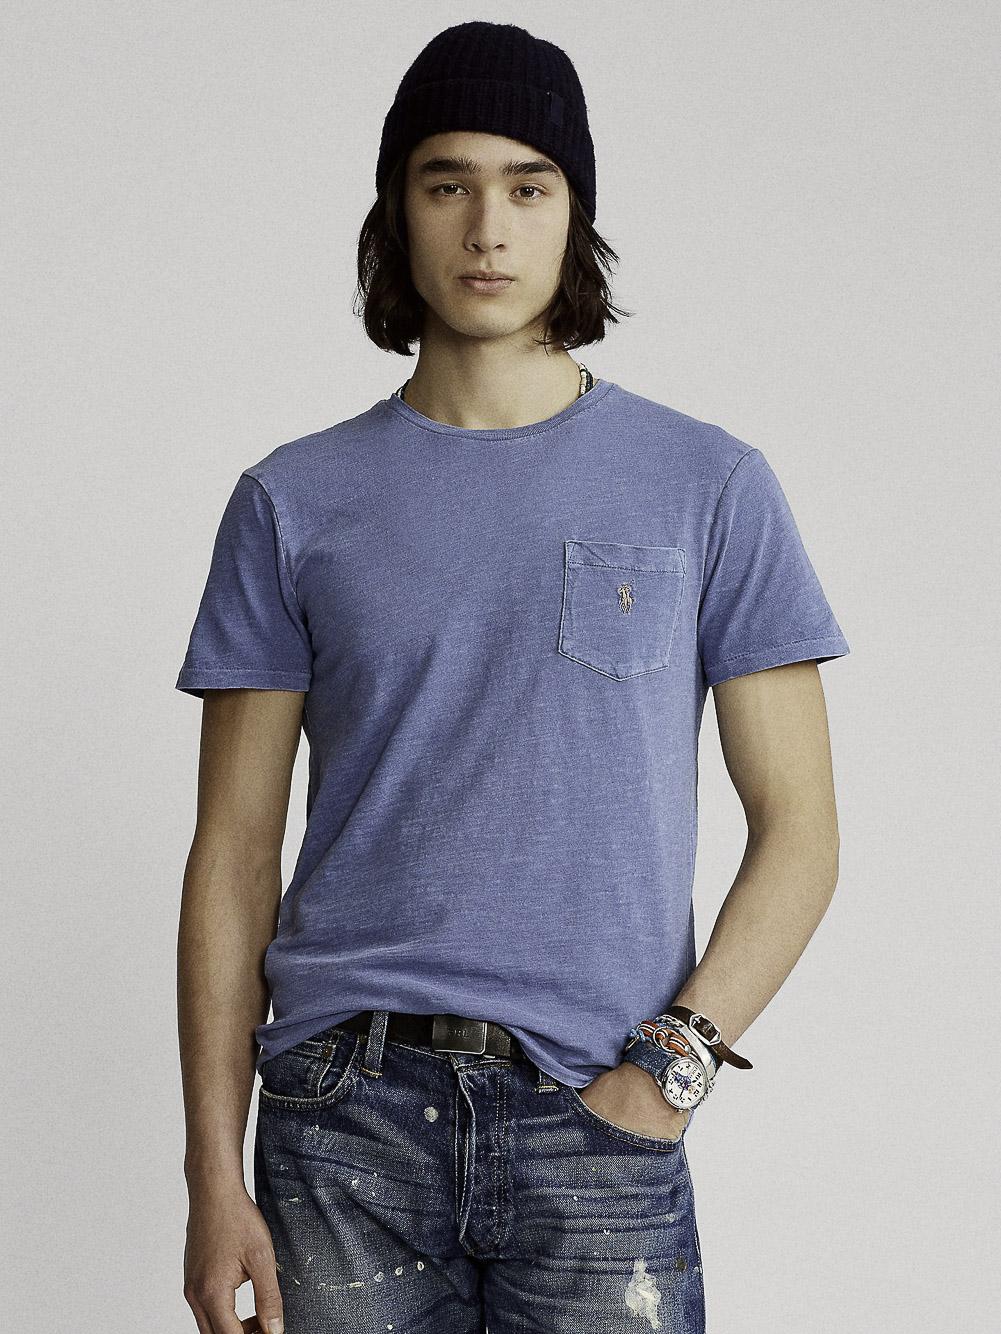 POLO RALPH LAUREN Μπλούζα T-Shirt 710795137012 ΓΑΛΑΖΙΟ